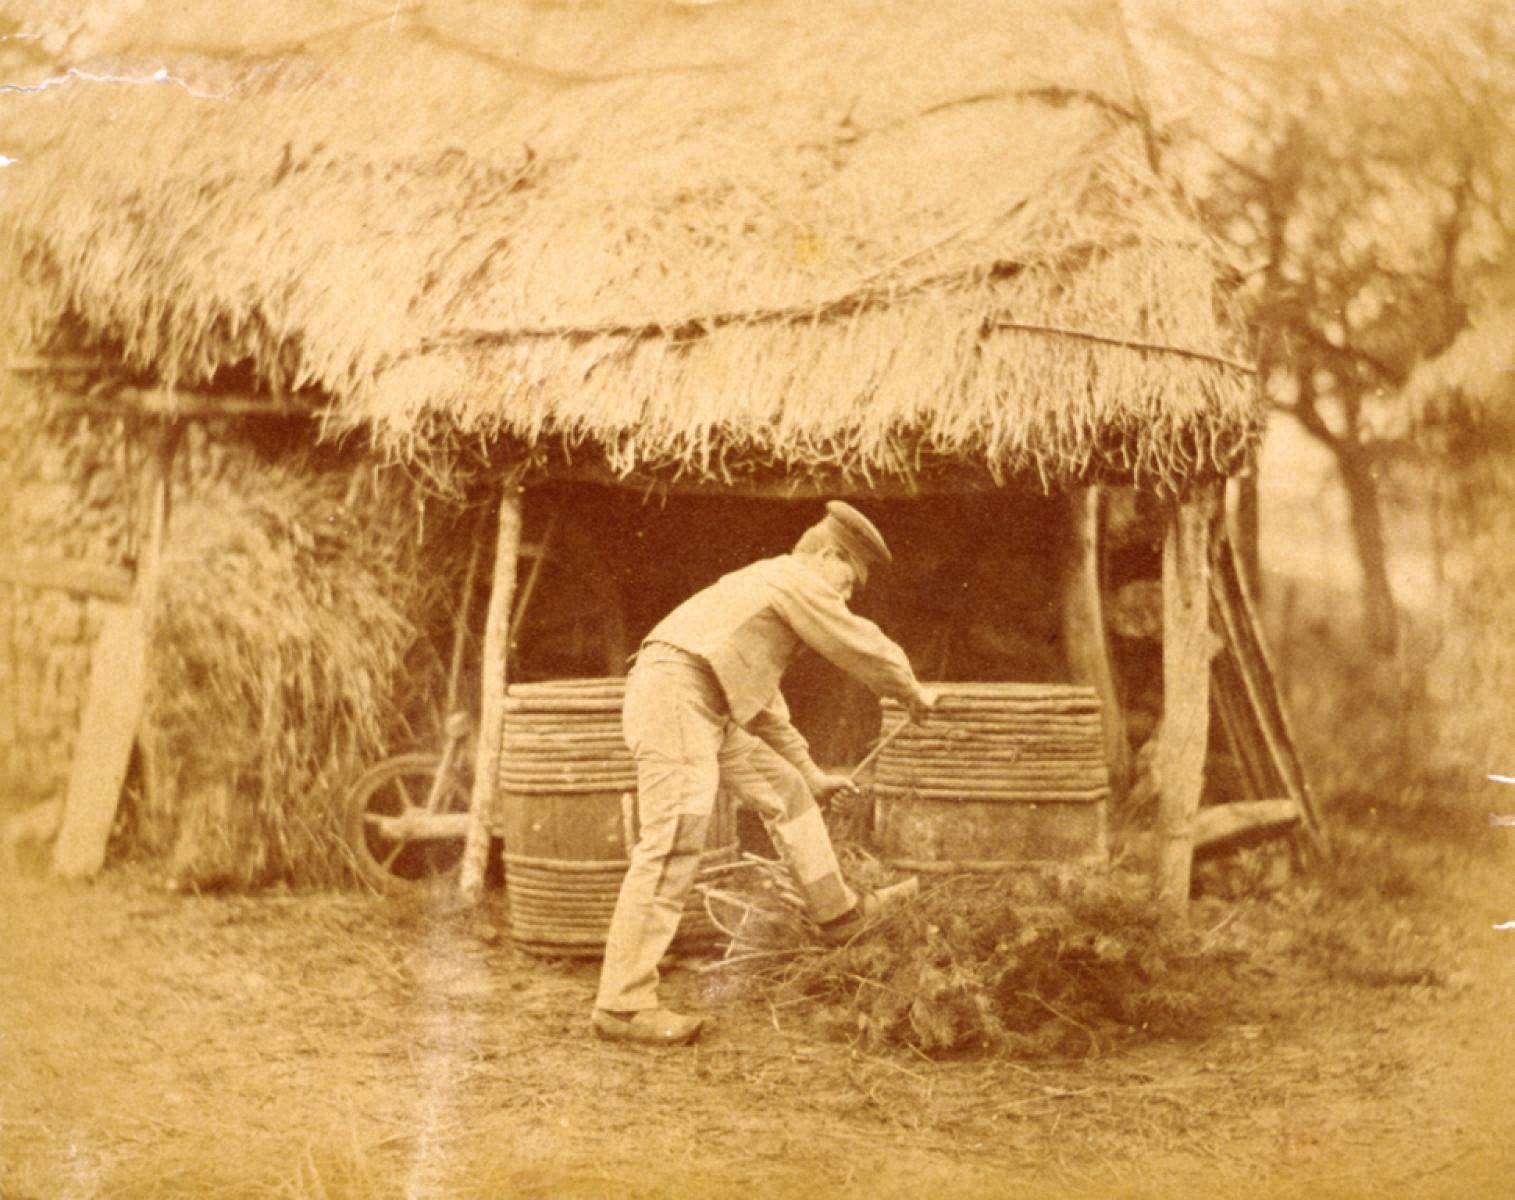 自然の習作 農夫